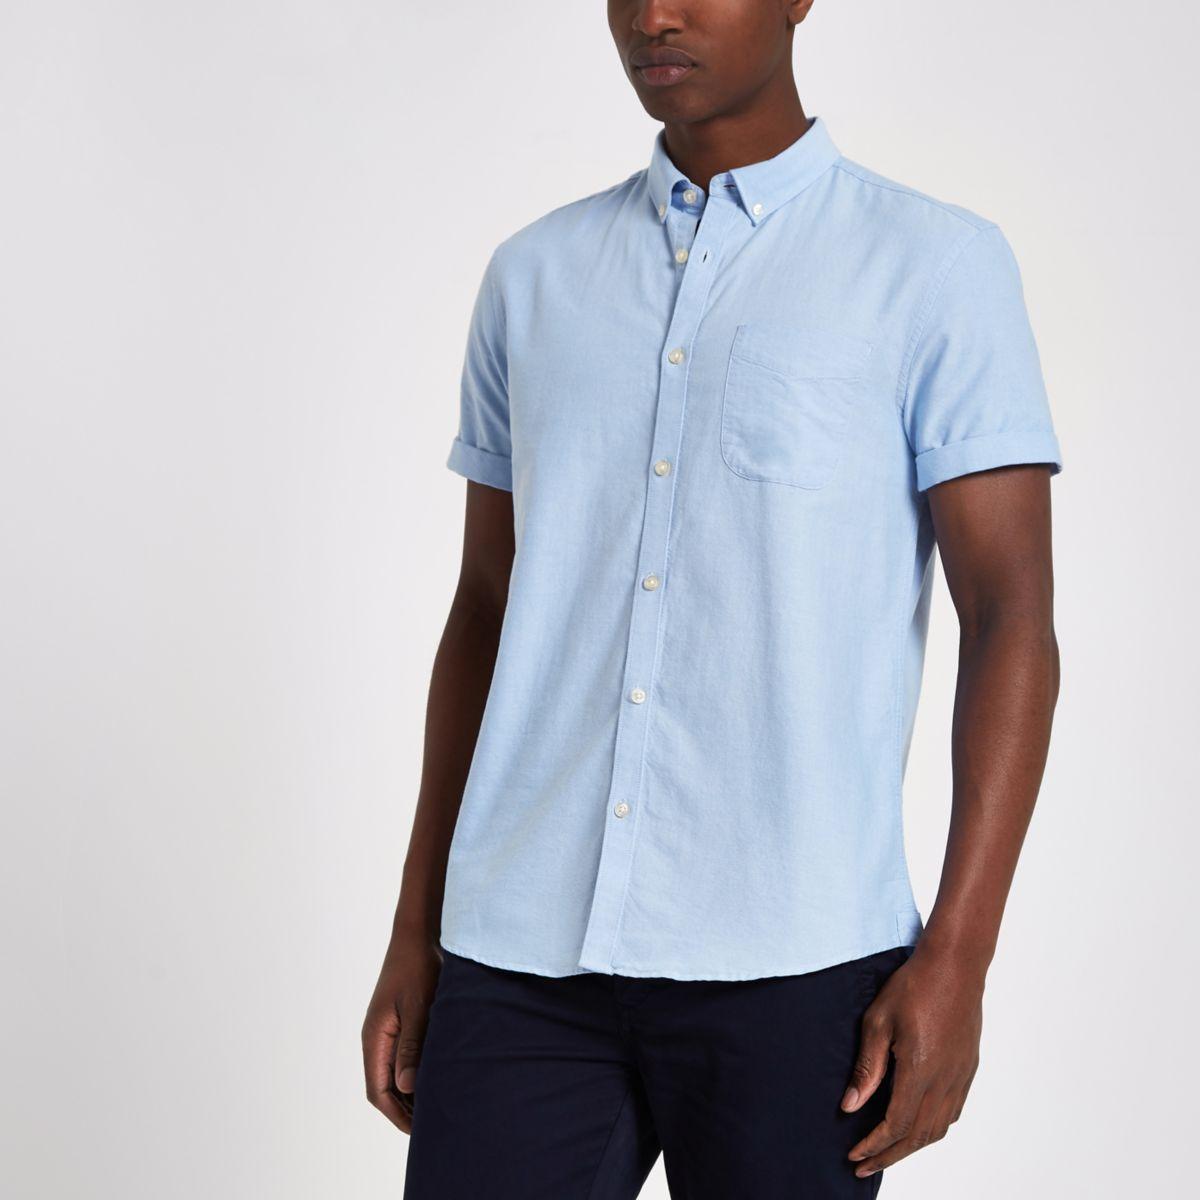 Blue short sleeve Oxford shirt